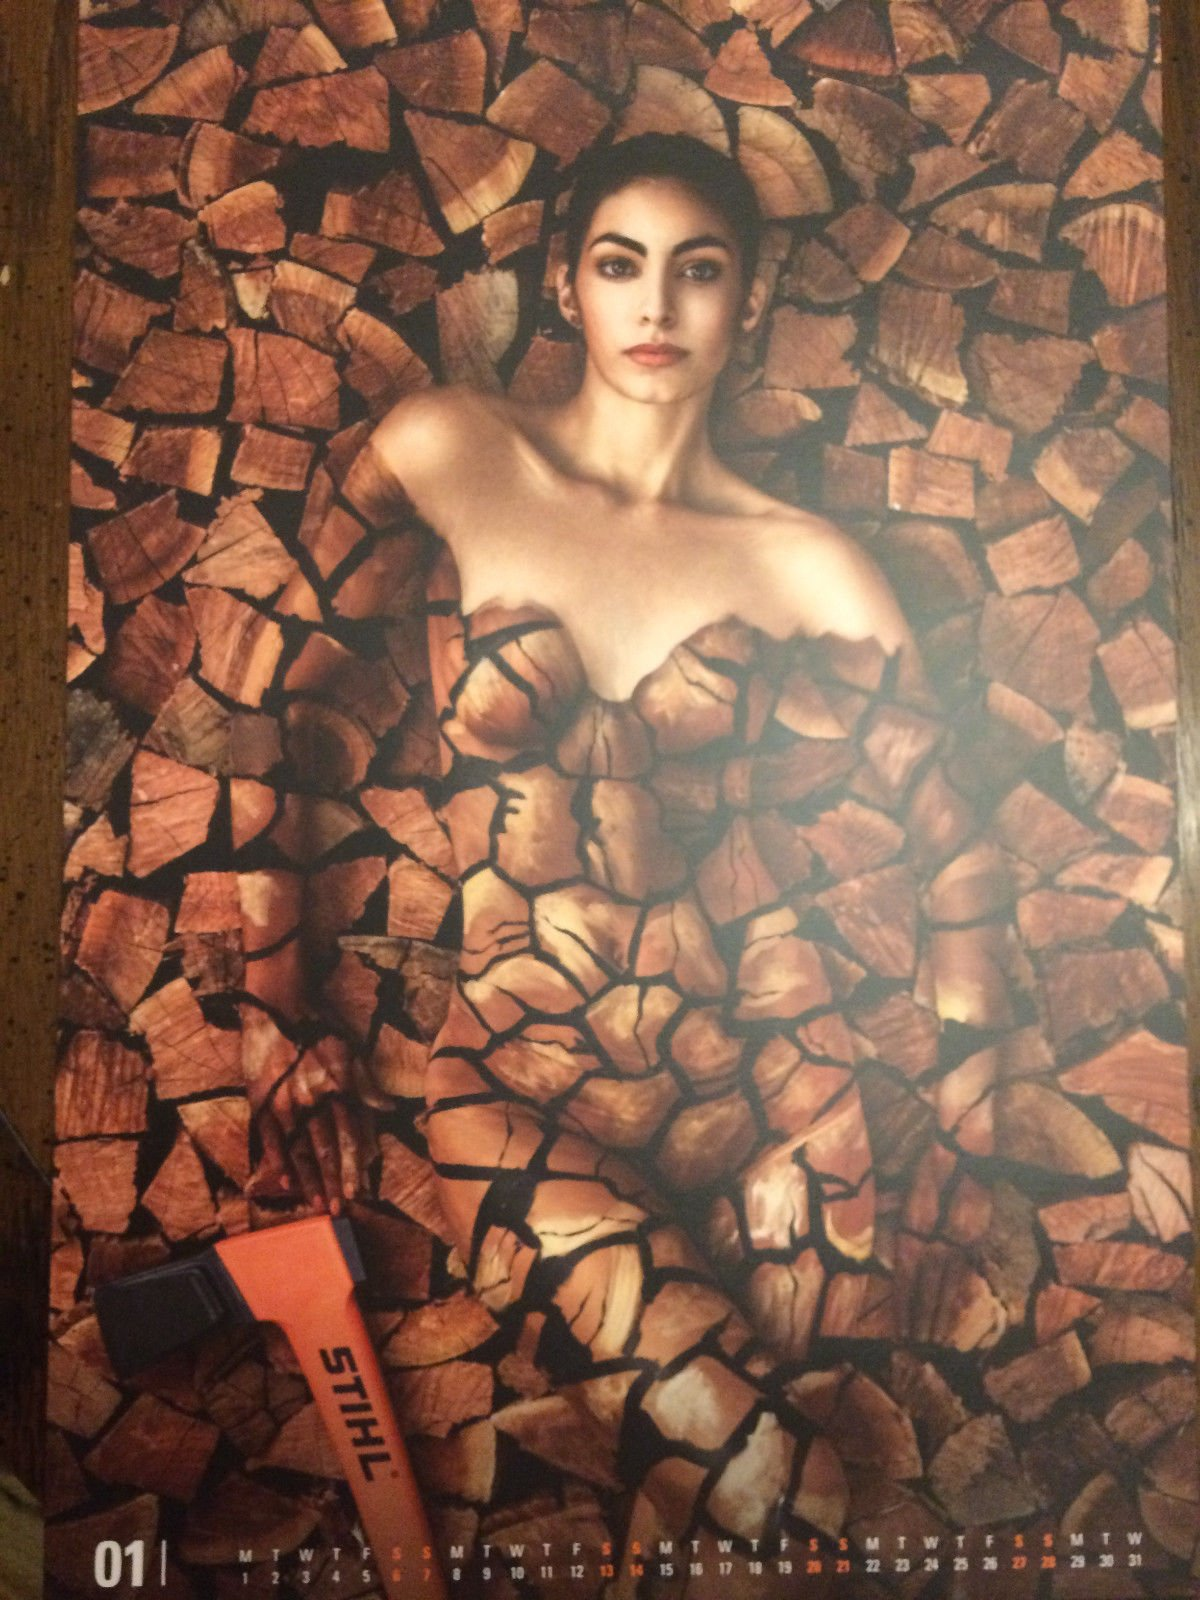 Calendario Stihl.Stihl 2018 Arborist Calendar With Women And Man Stihl